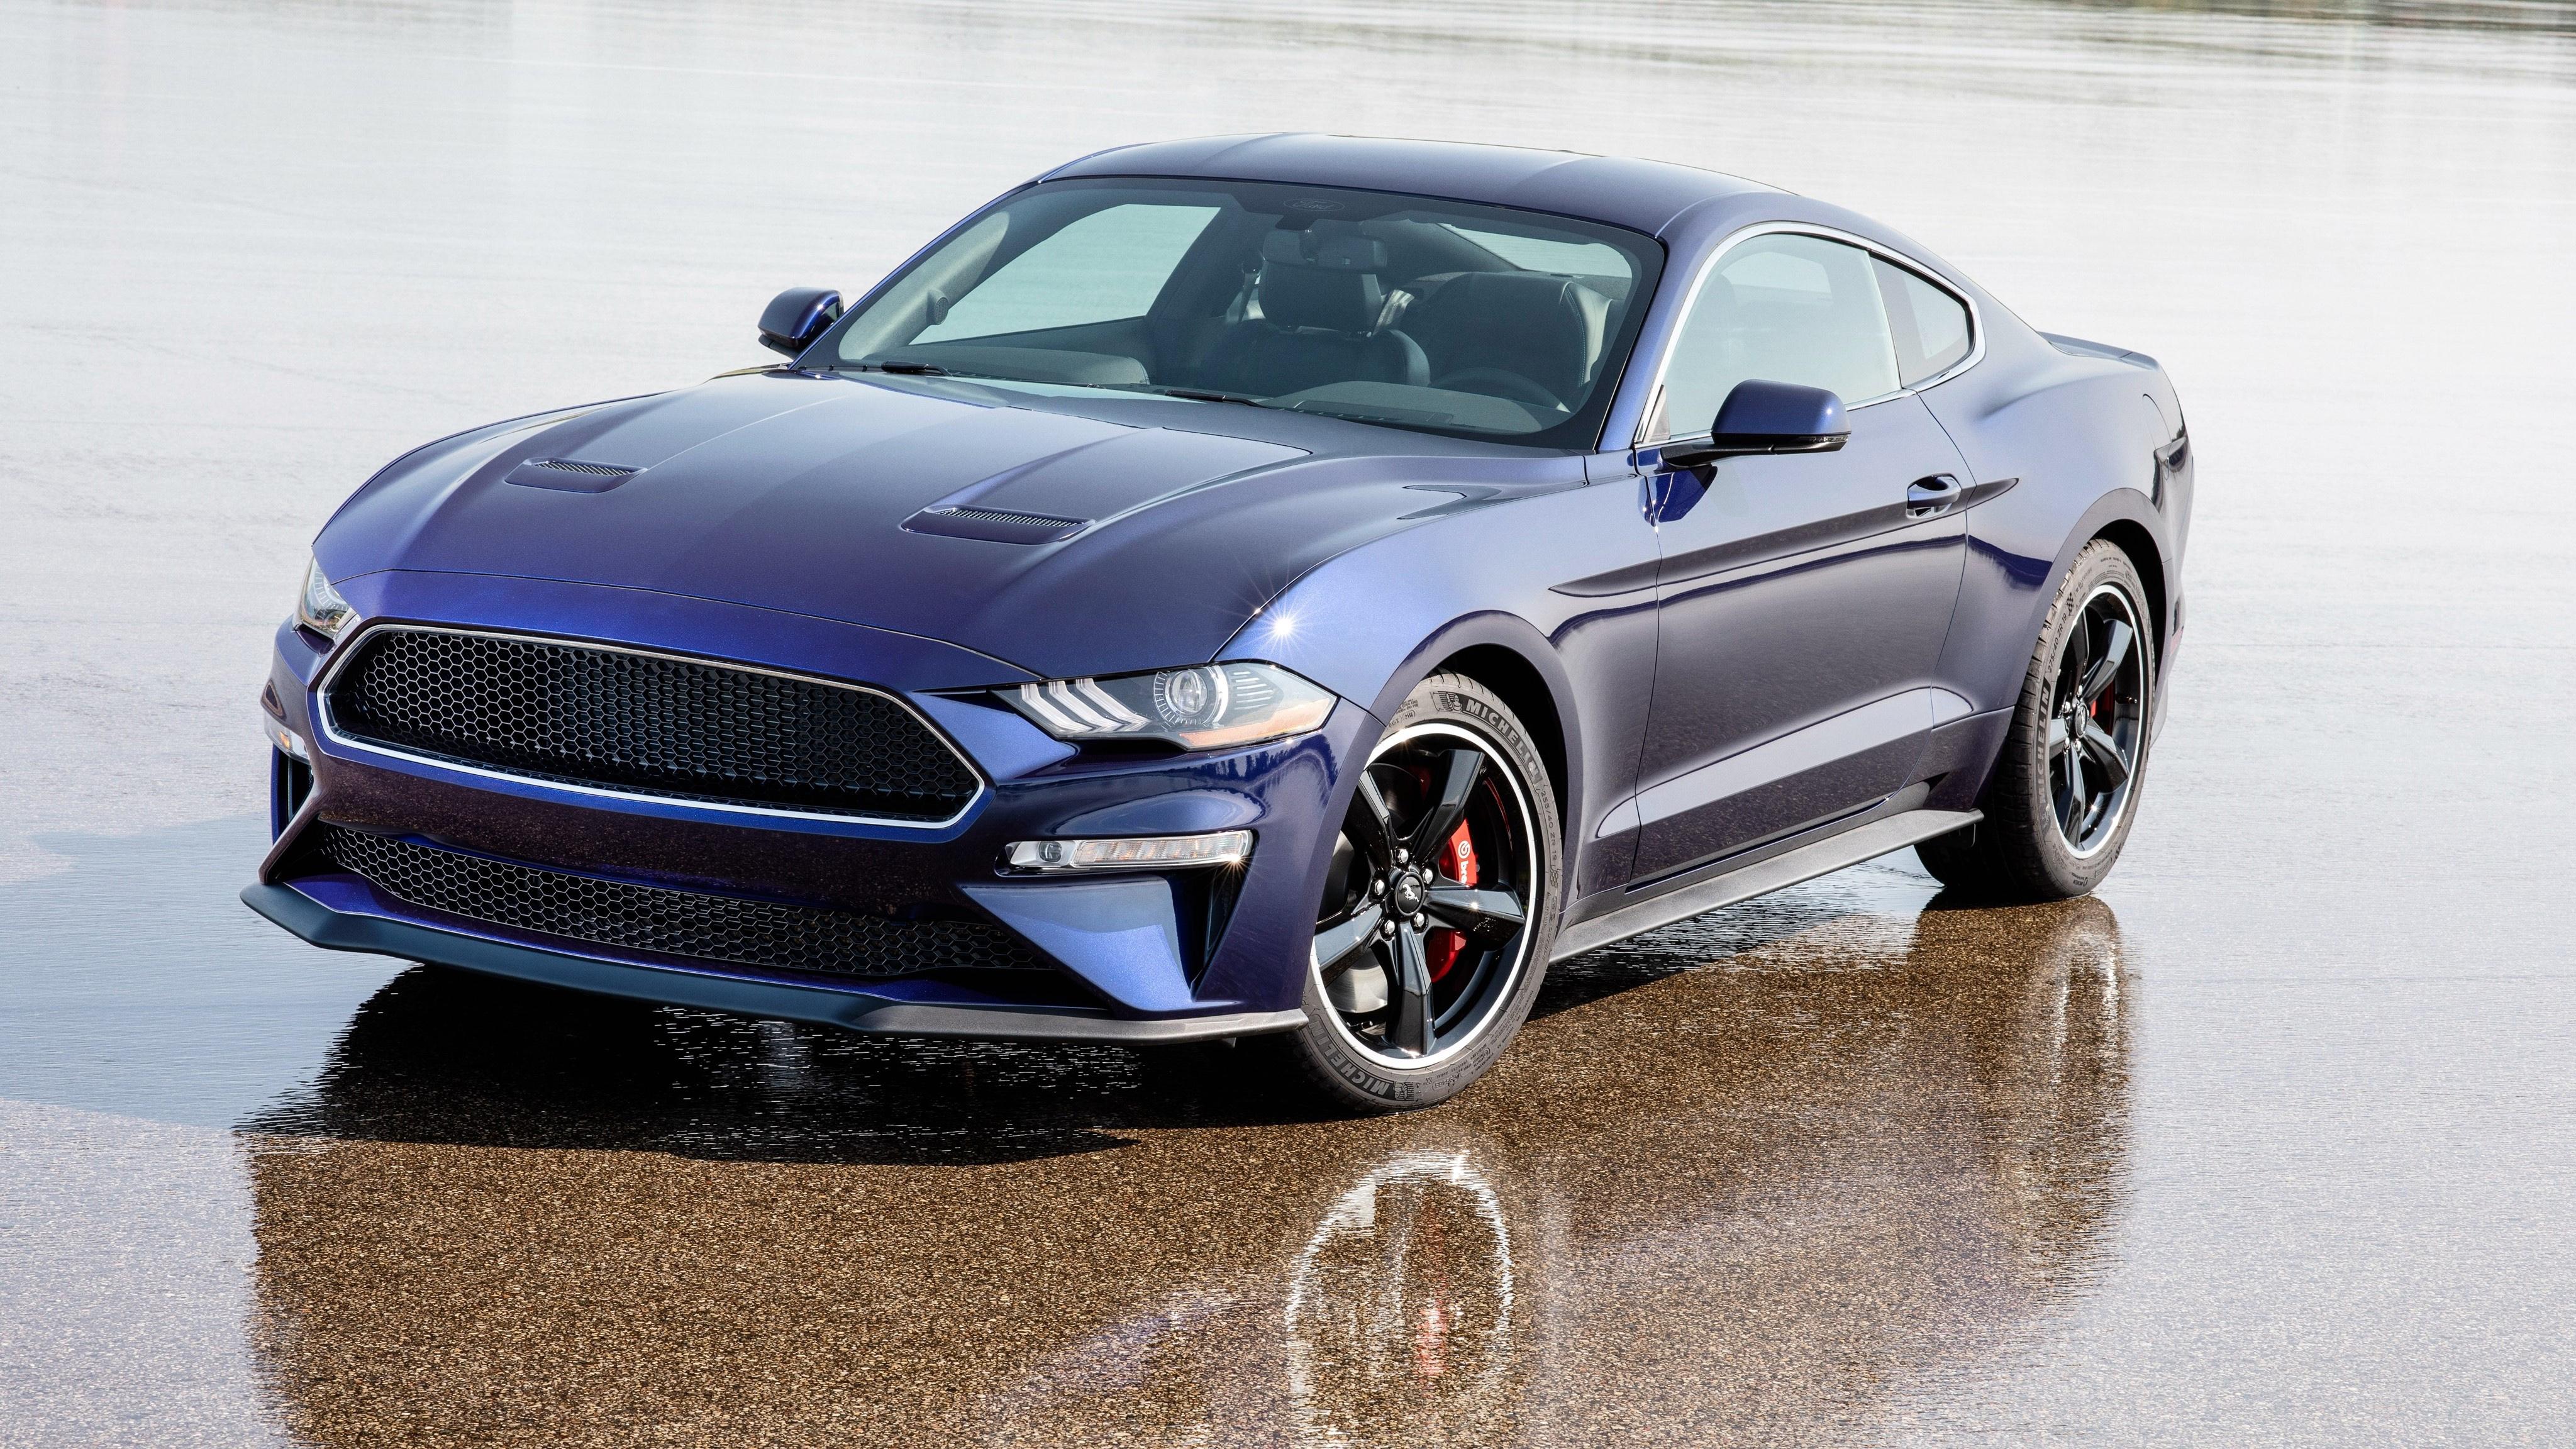 2019 Ford Mustang Bullitt Kona Blue 4K Wallpaper | HD Car Wallpapers | ID #11032